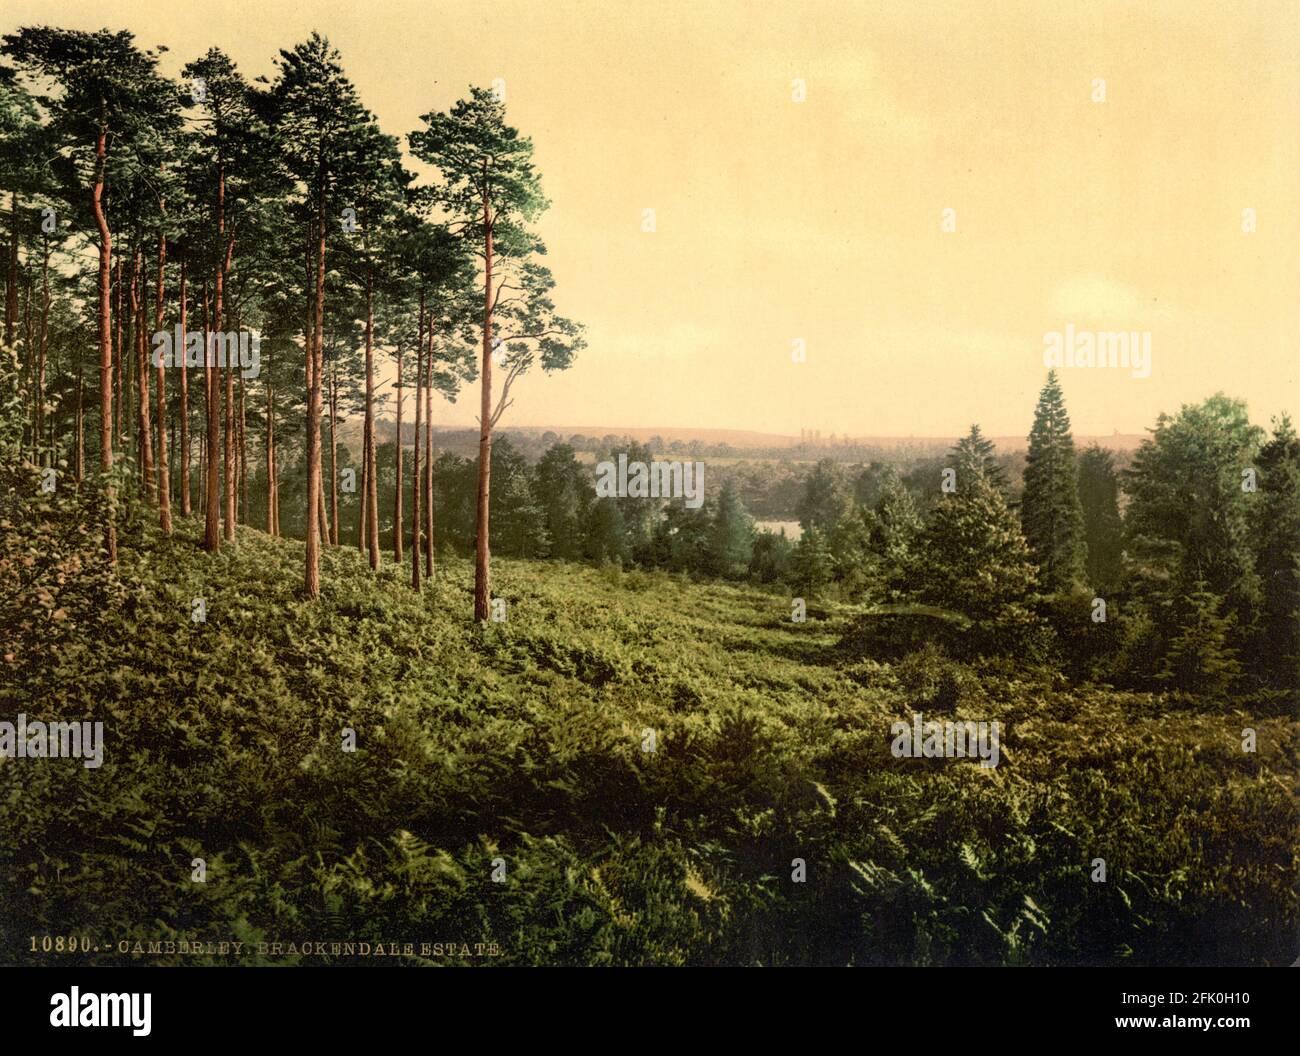 Brackendale Estate, Camberley in Surrey circa 1890-1900 Stock Photo